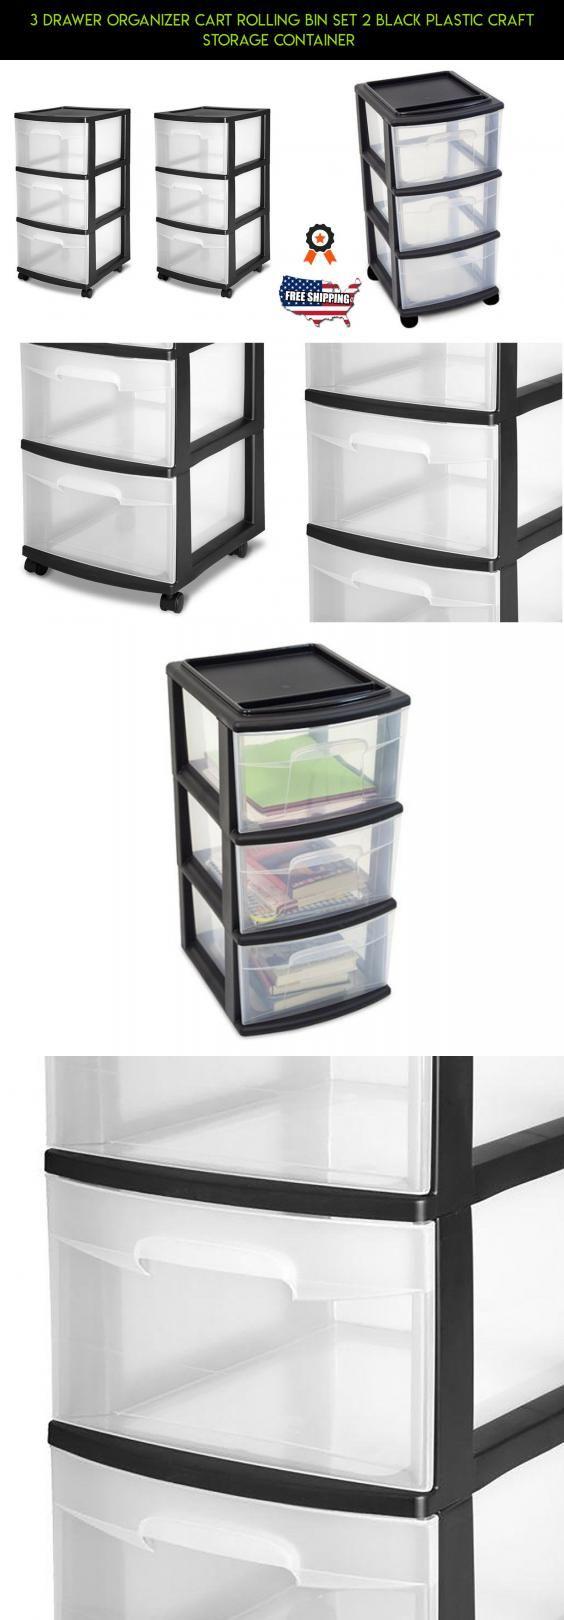 Craft storage drawers plastic - 3 Drawer Organizer Cart Rolling Bin Set 2 Black Plastic Craft Storage Container Technology